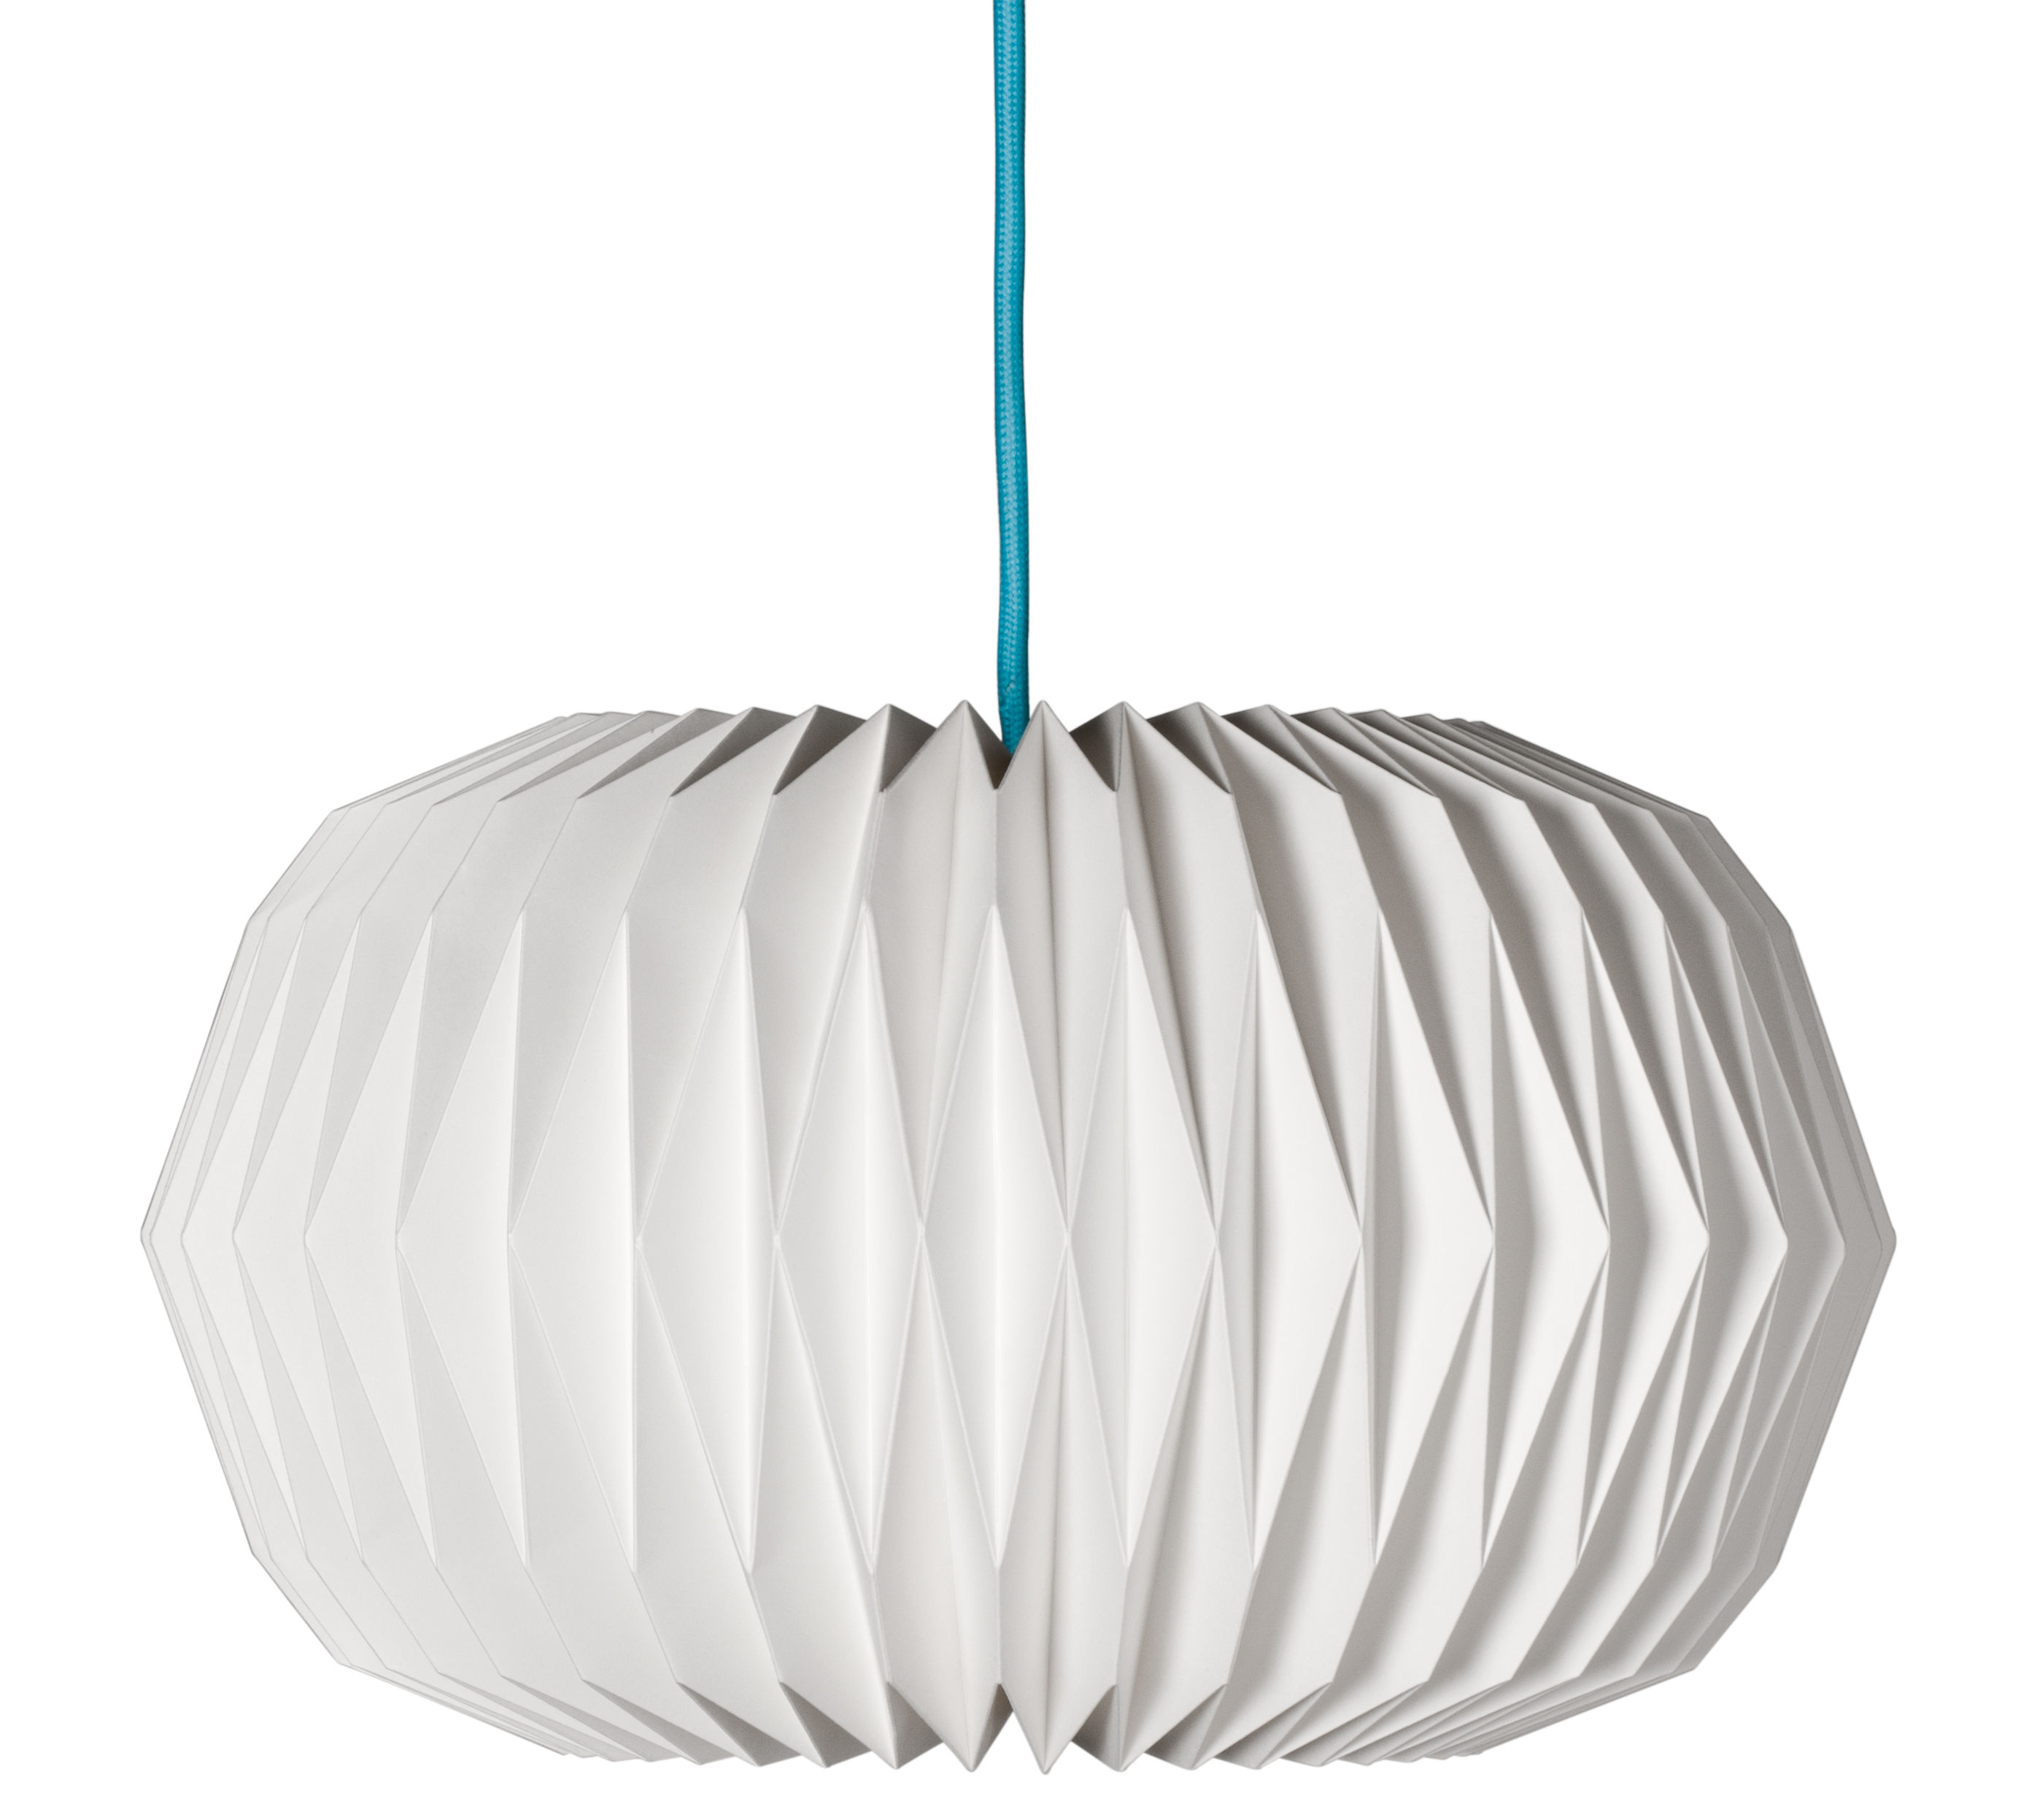 Luminaire - Suspensions - Suspension Paper Velocity Ø 35 x H 20 cm - Made in design Editions - Blanc / Câble noir - Papier